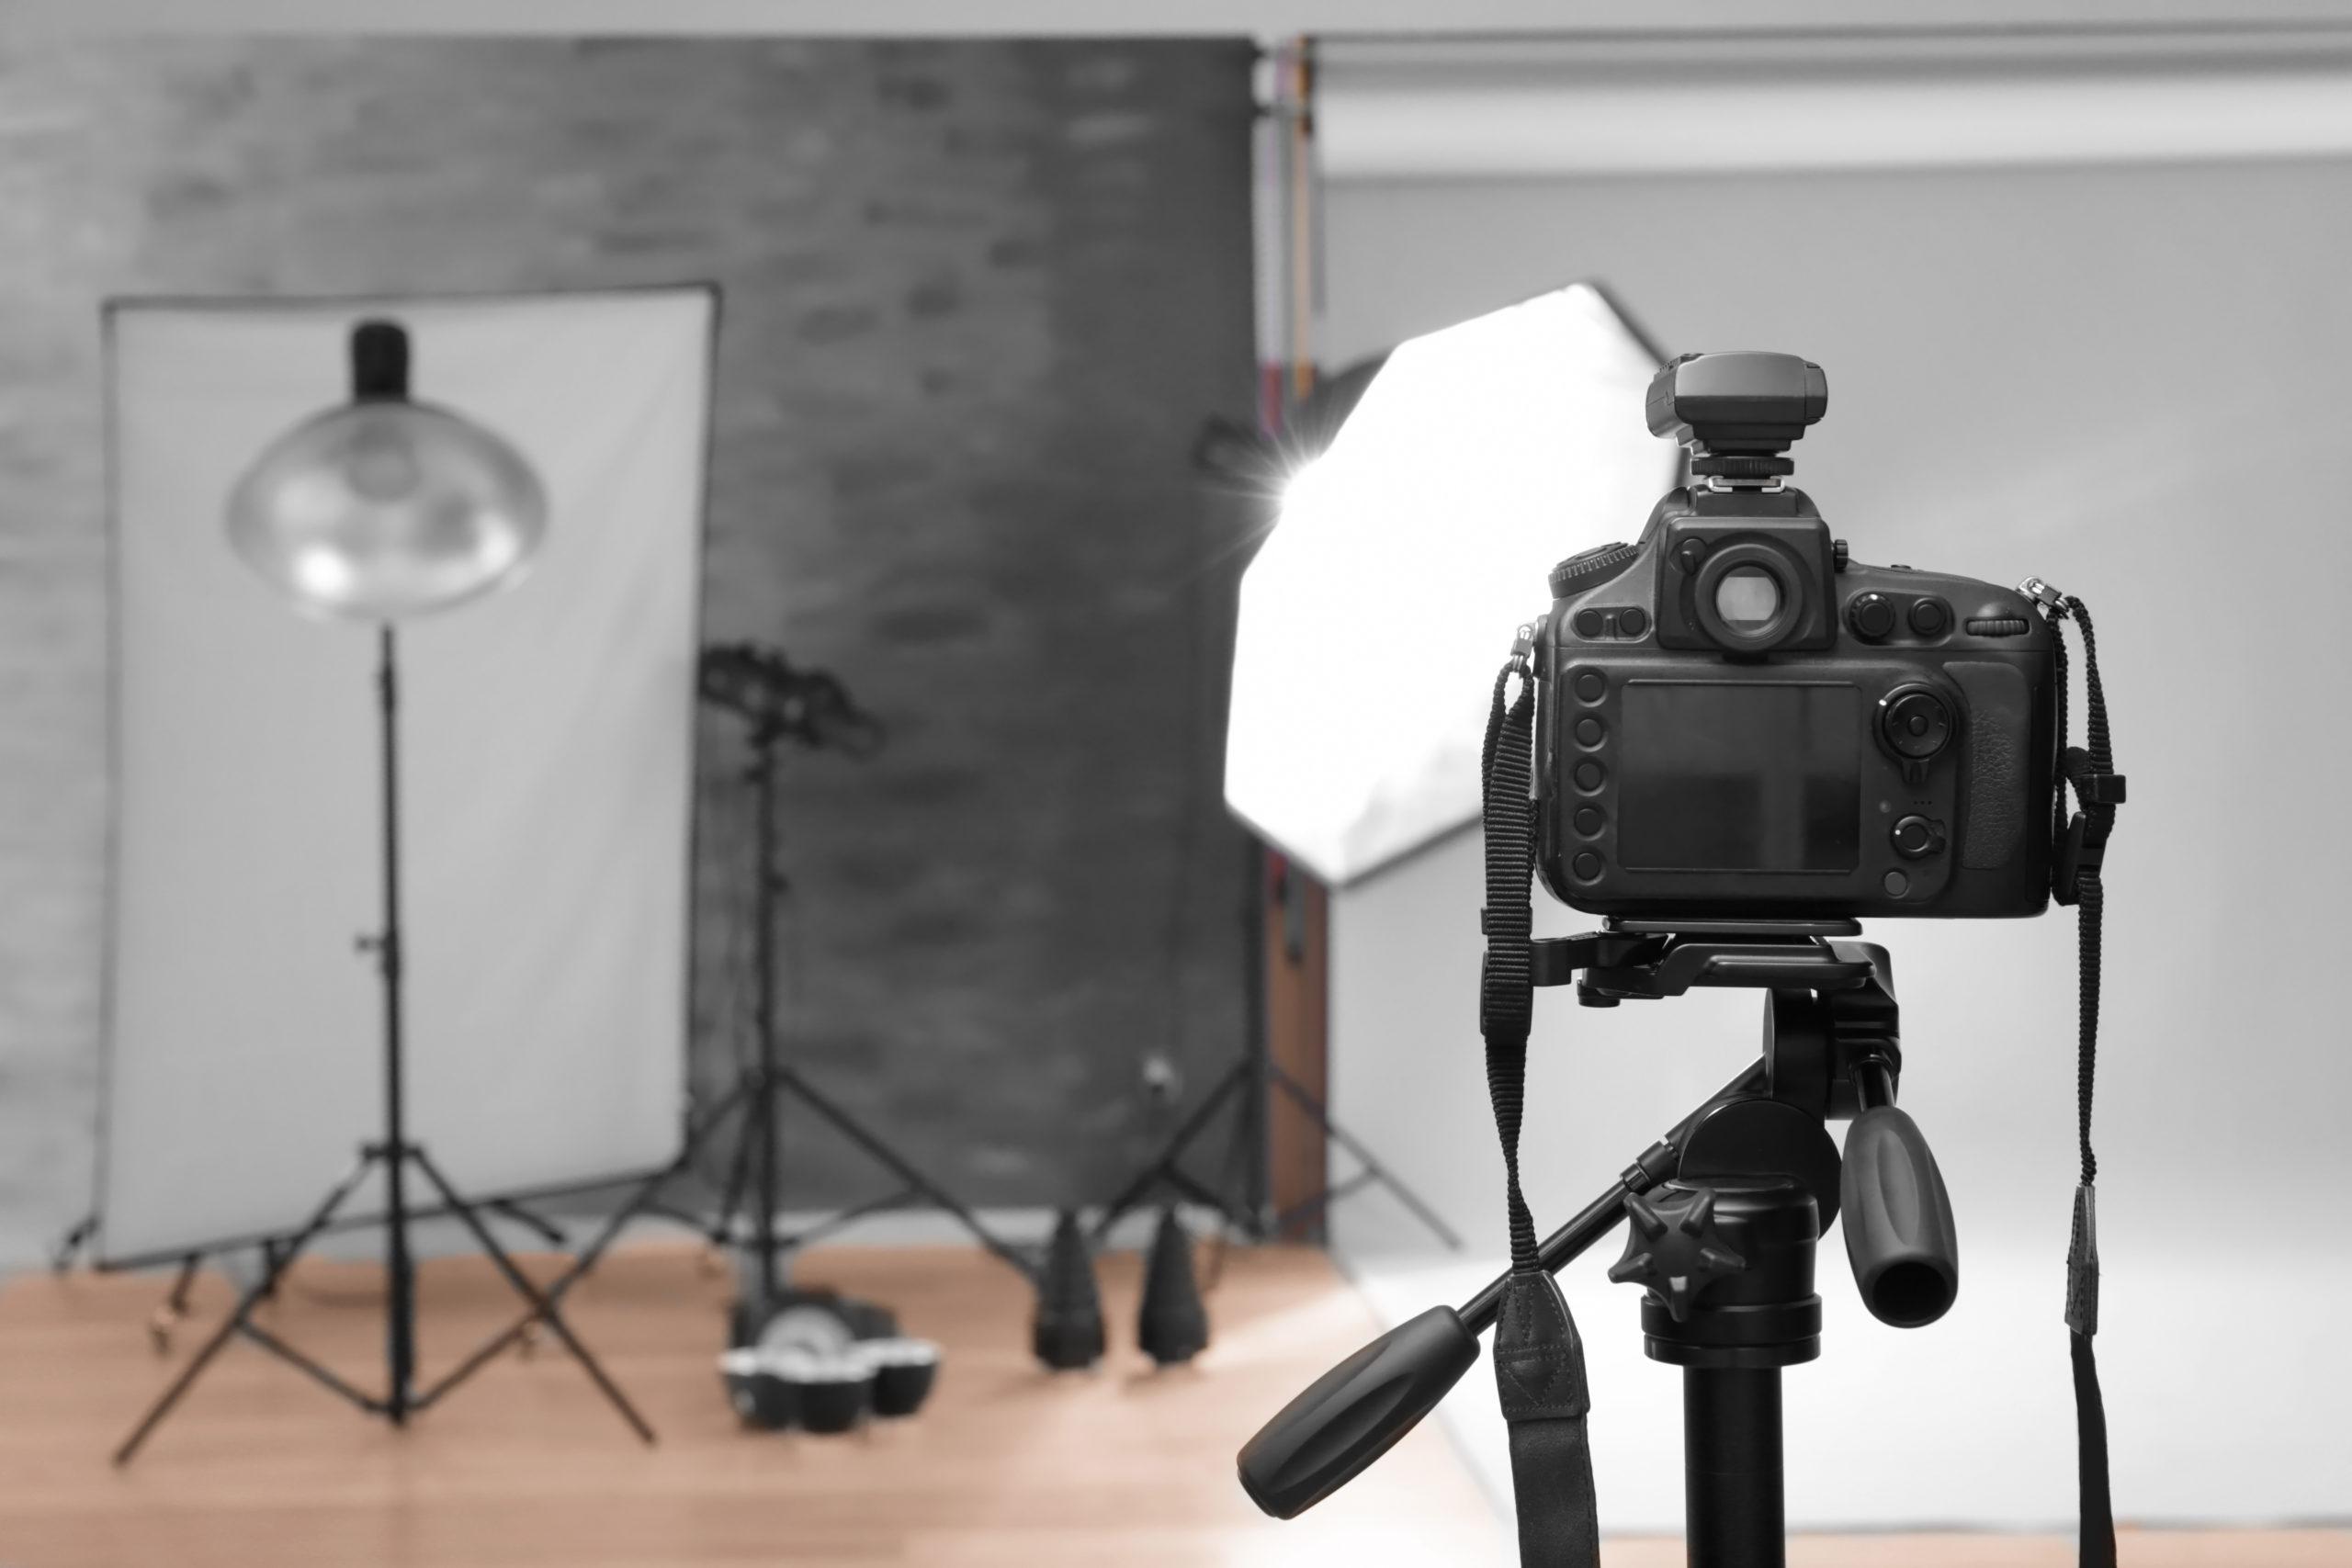 modern-photo-studio-professional-equipment-633322859